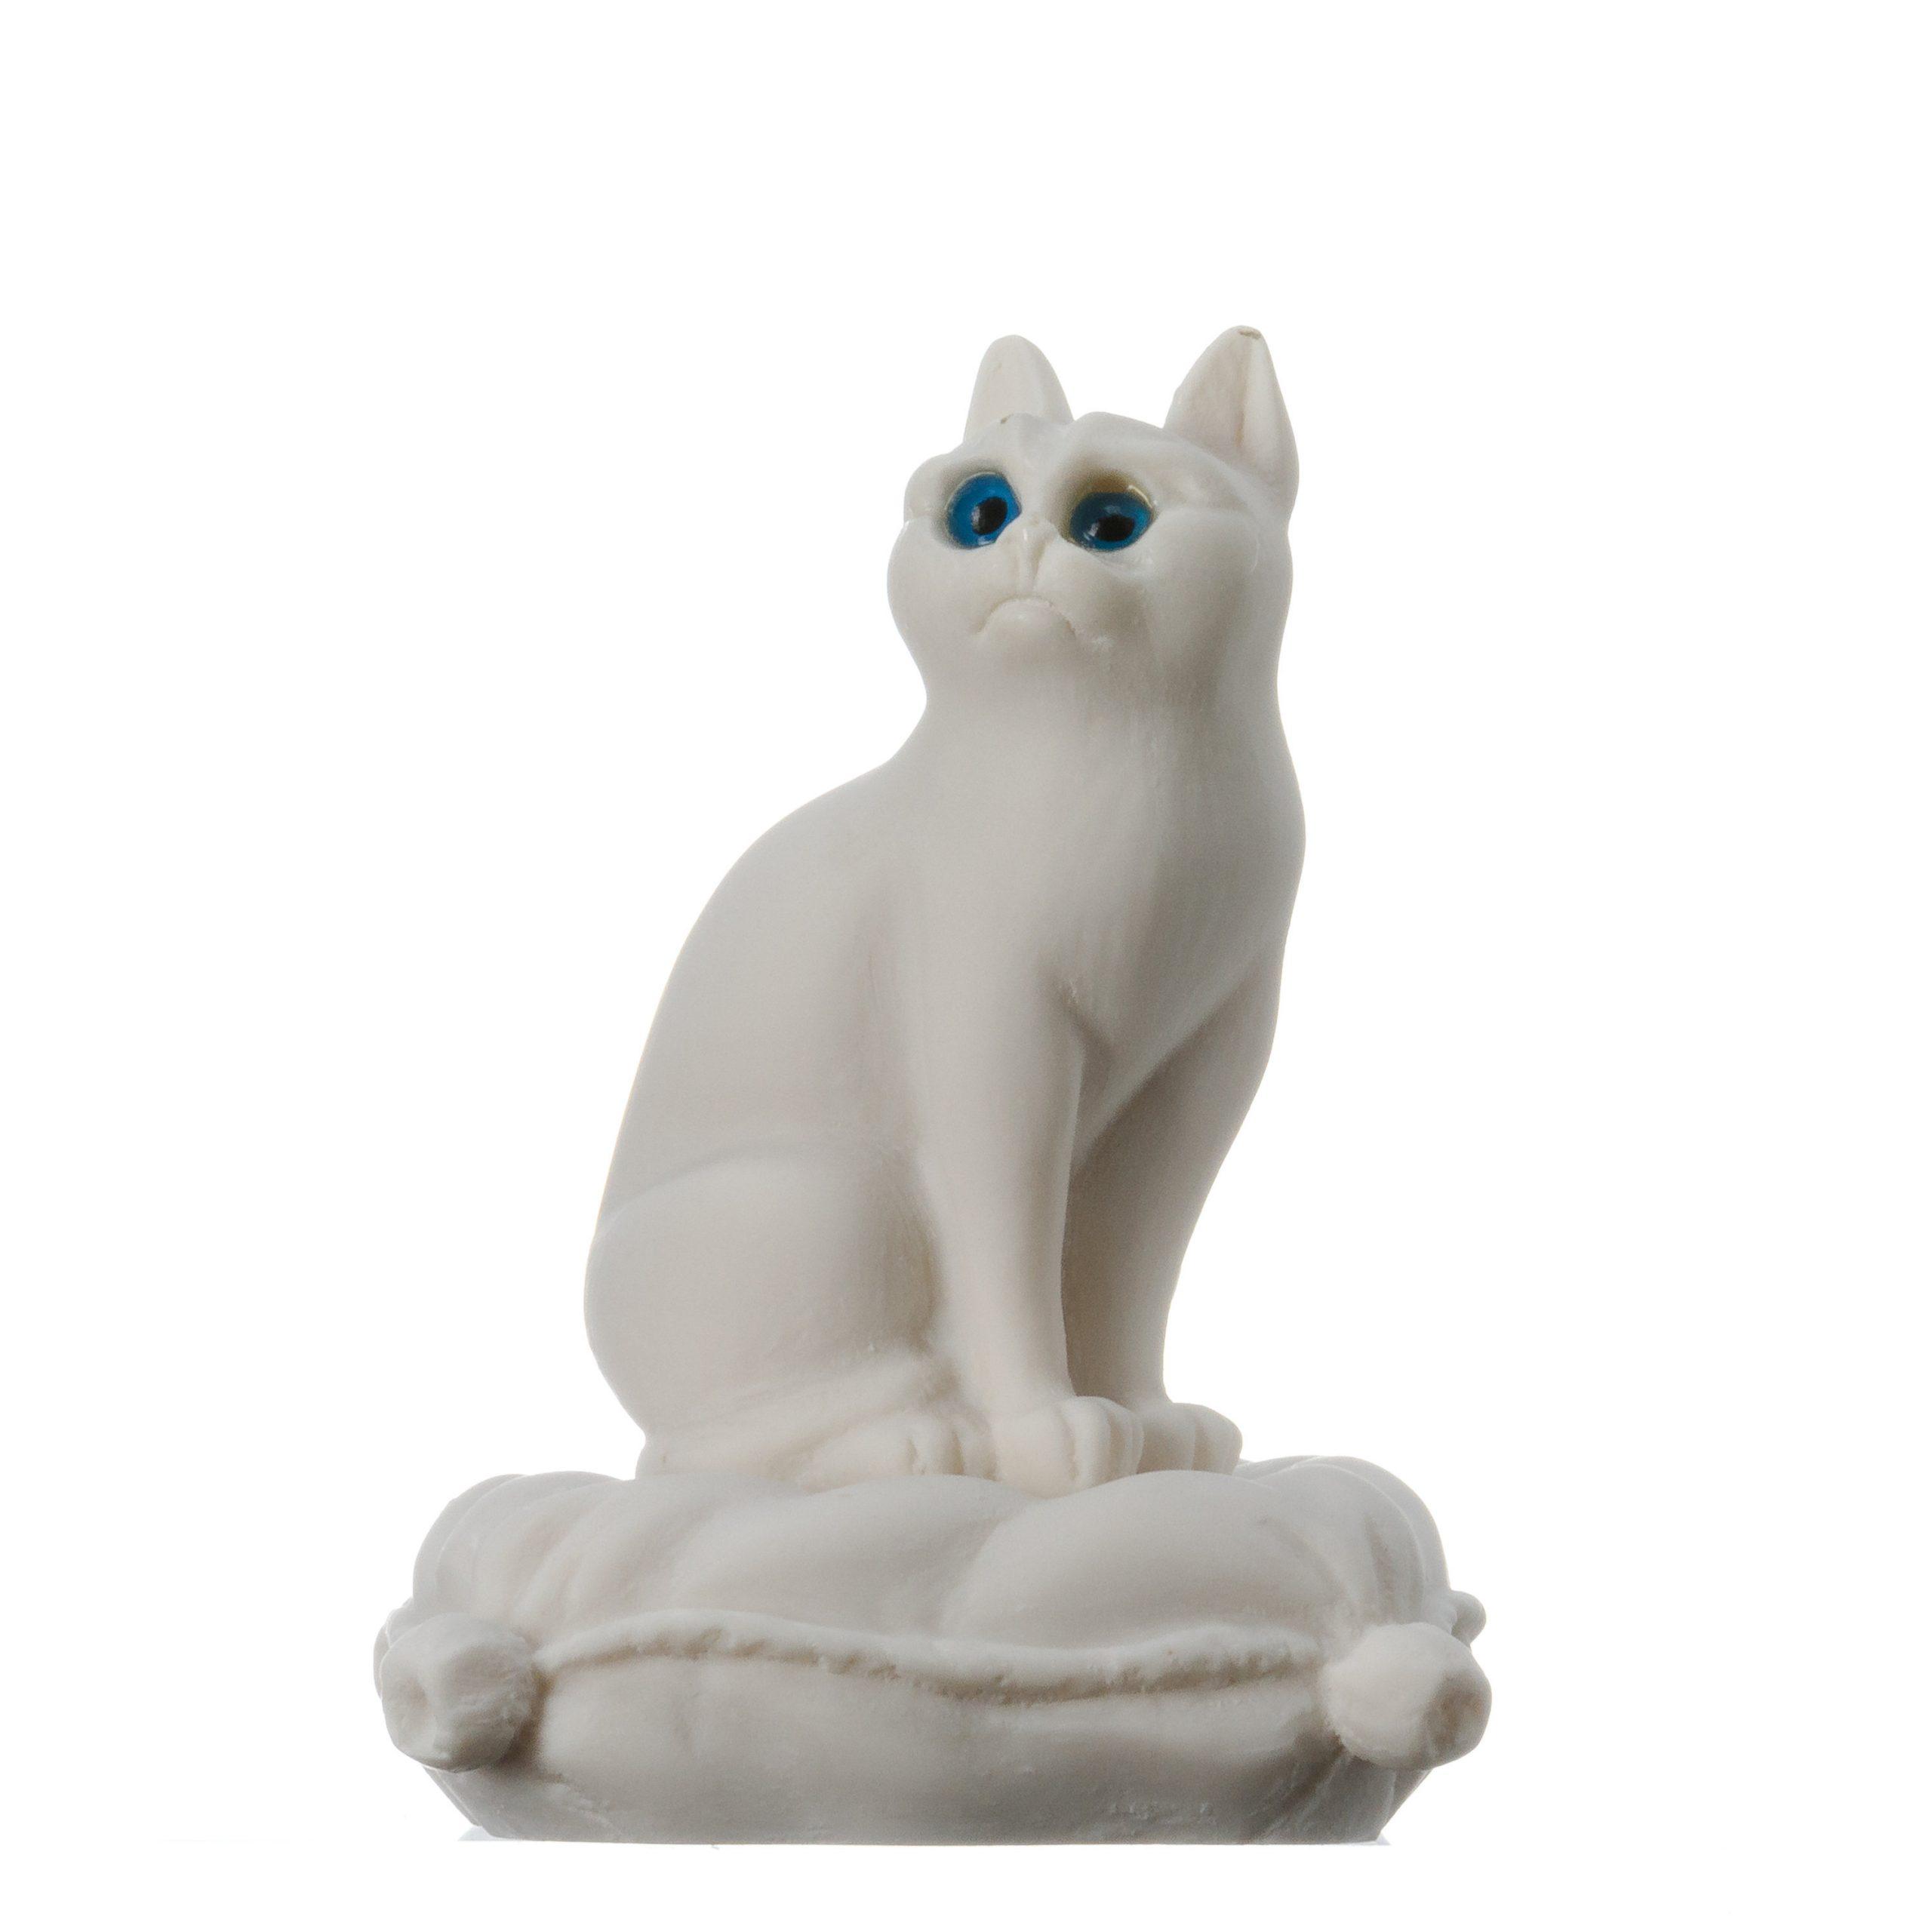 Cat Sitting on Pillow Alabaster White sculpture Handmade 6.2''